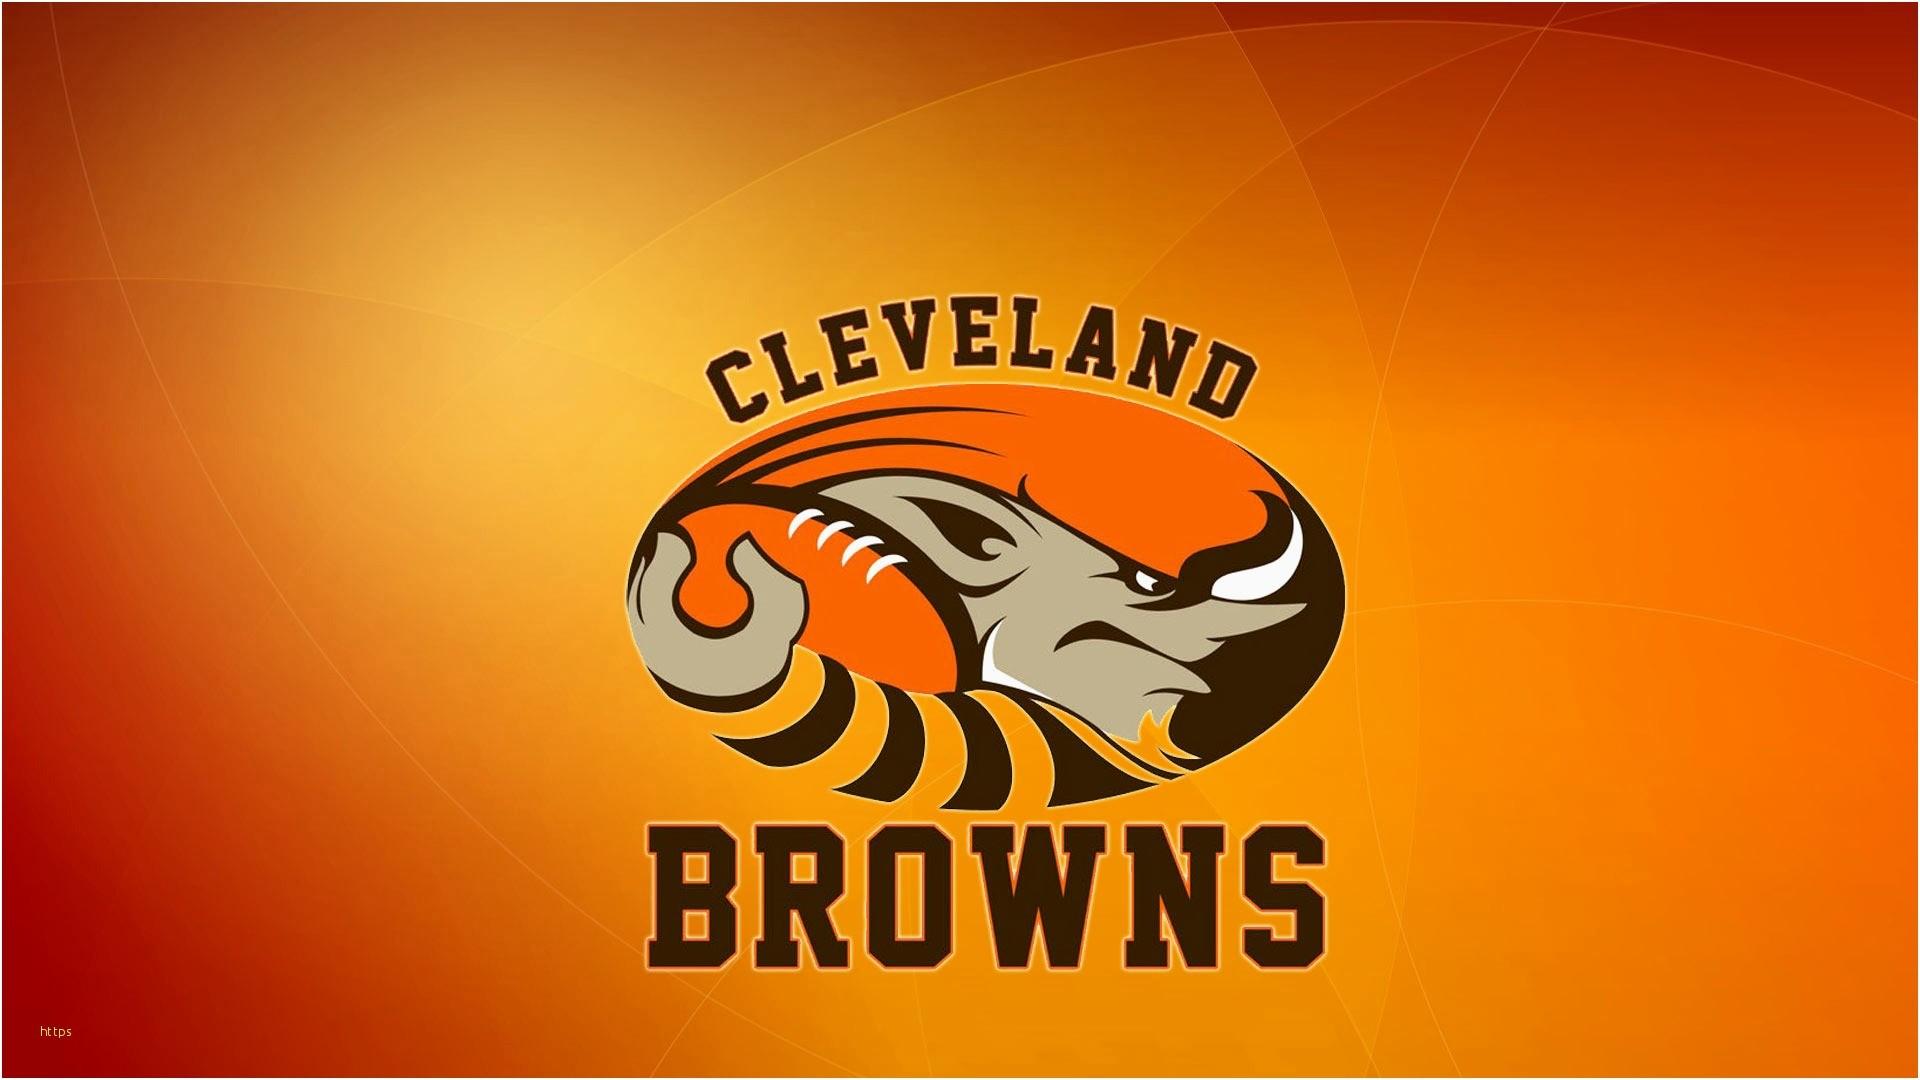 Res: 1920x1080, Cleveland Browns Wallpaper Inspirational Download Minnesota Vikings Logo Hd  1080p Wallpaper Size